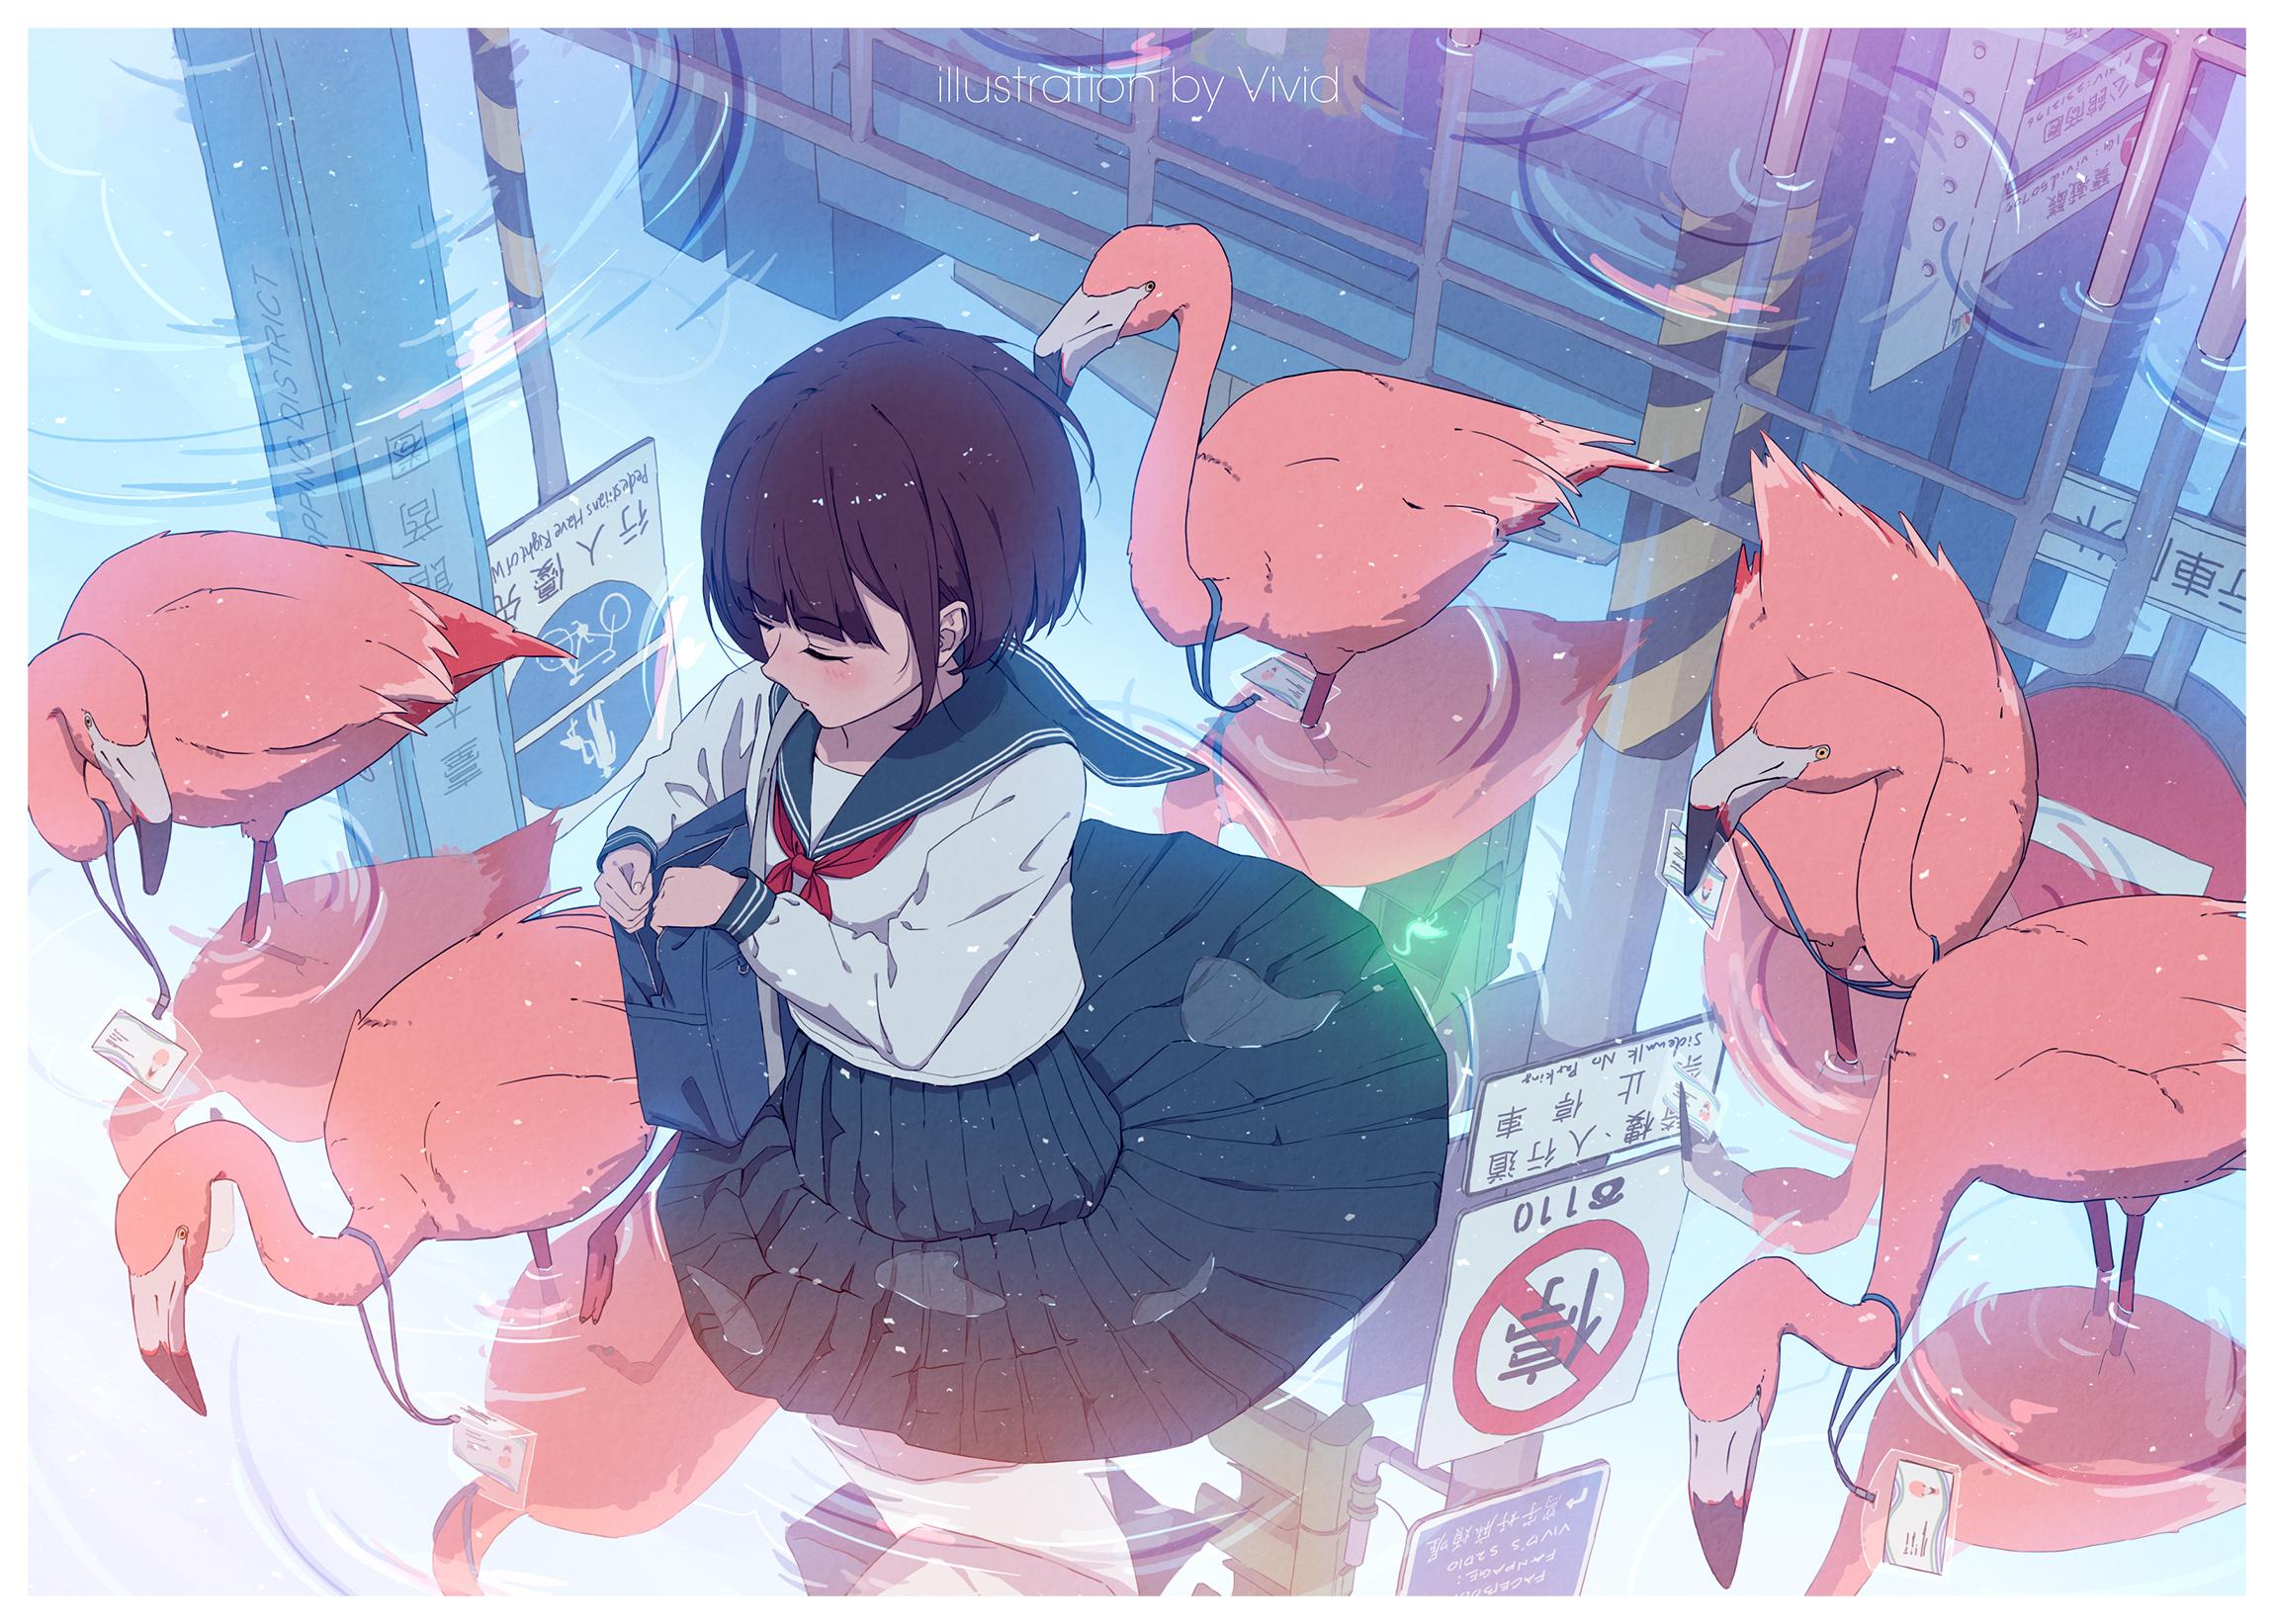 Anime 2300x1643 anime anime girls original characters short hair dark hair school uniform sailor uniform water reflection flamingos